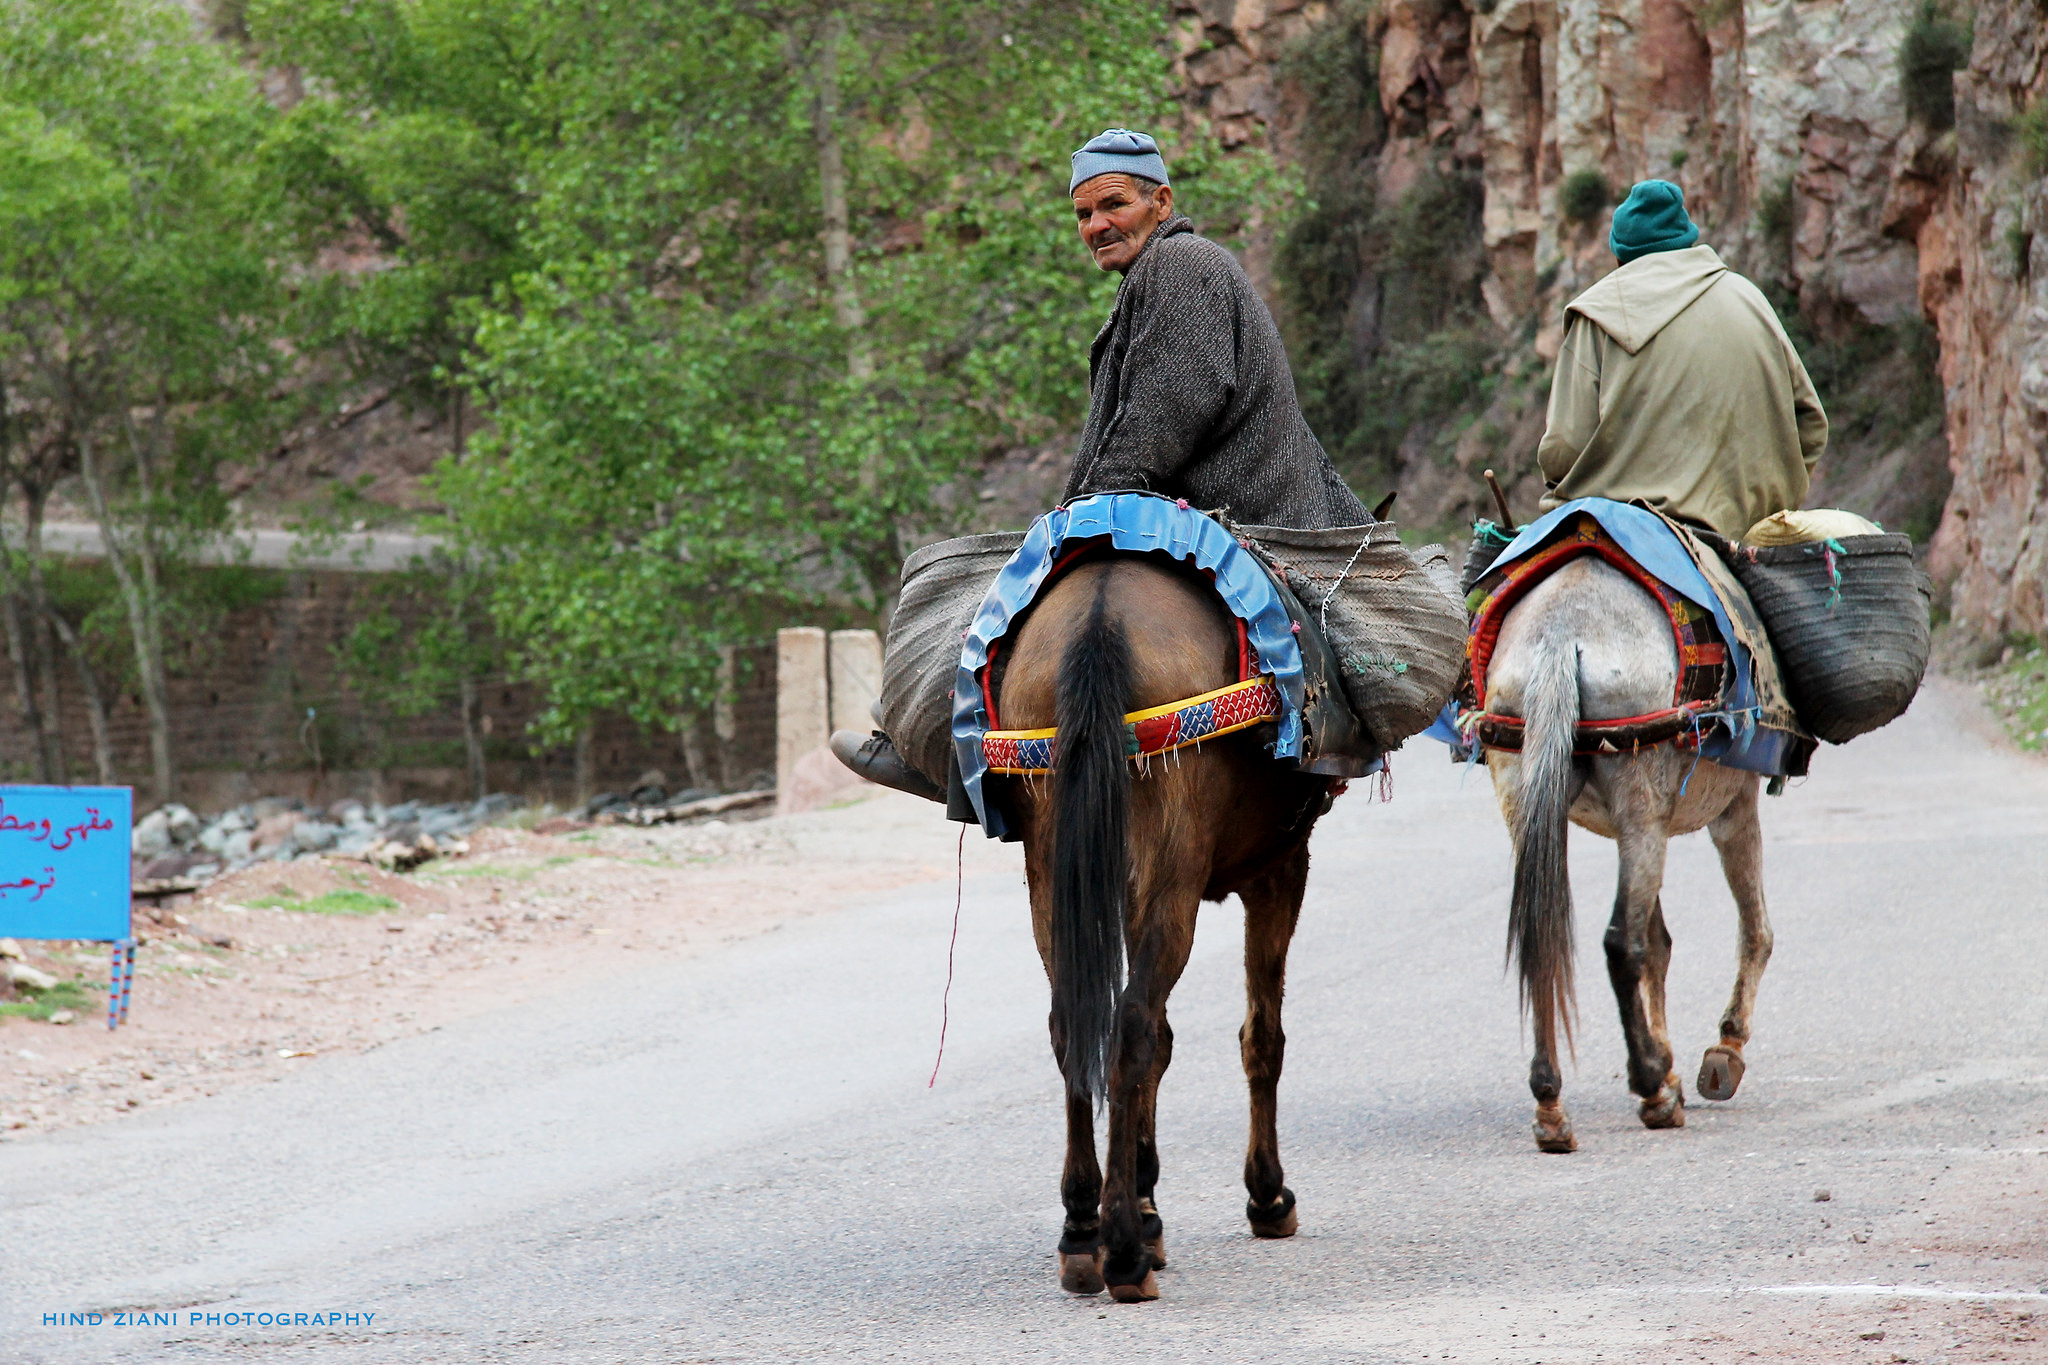 Riad El Youssoufi Marrakech Excursion Ourika Valley 6.jpg